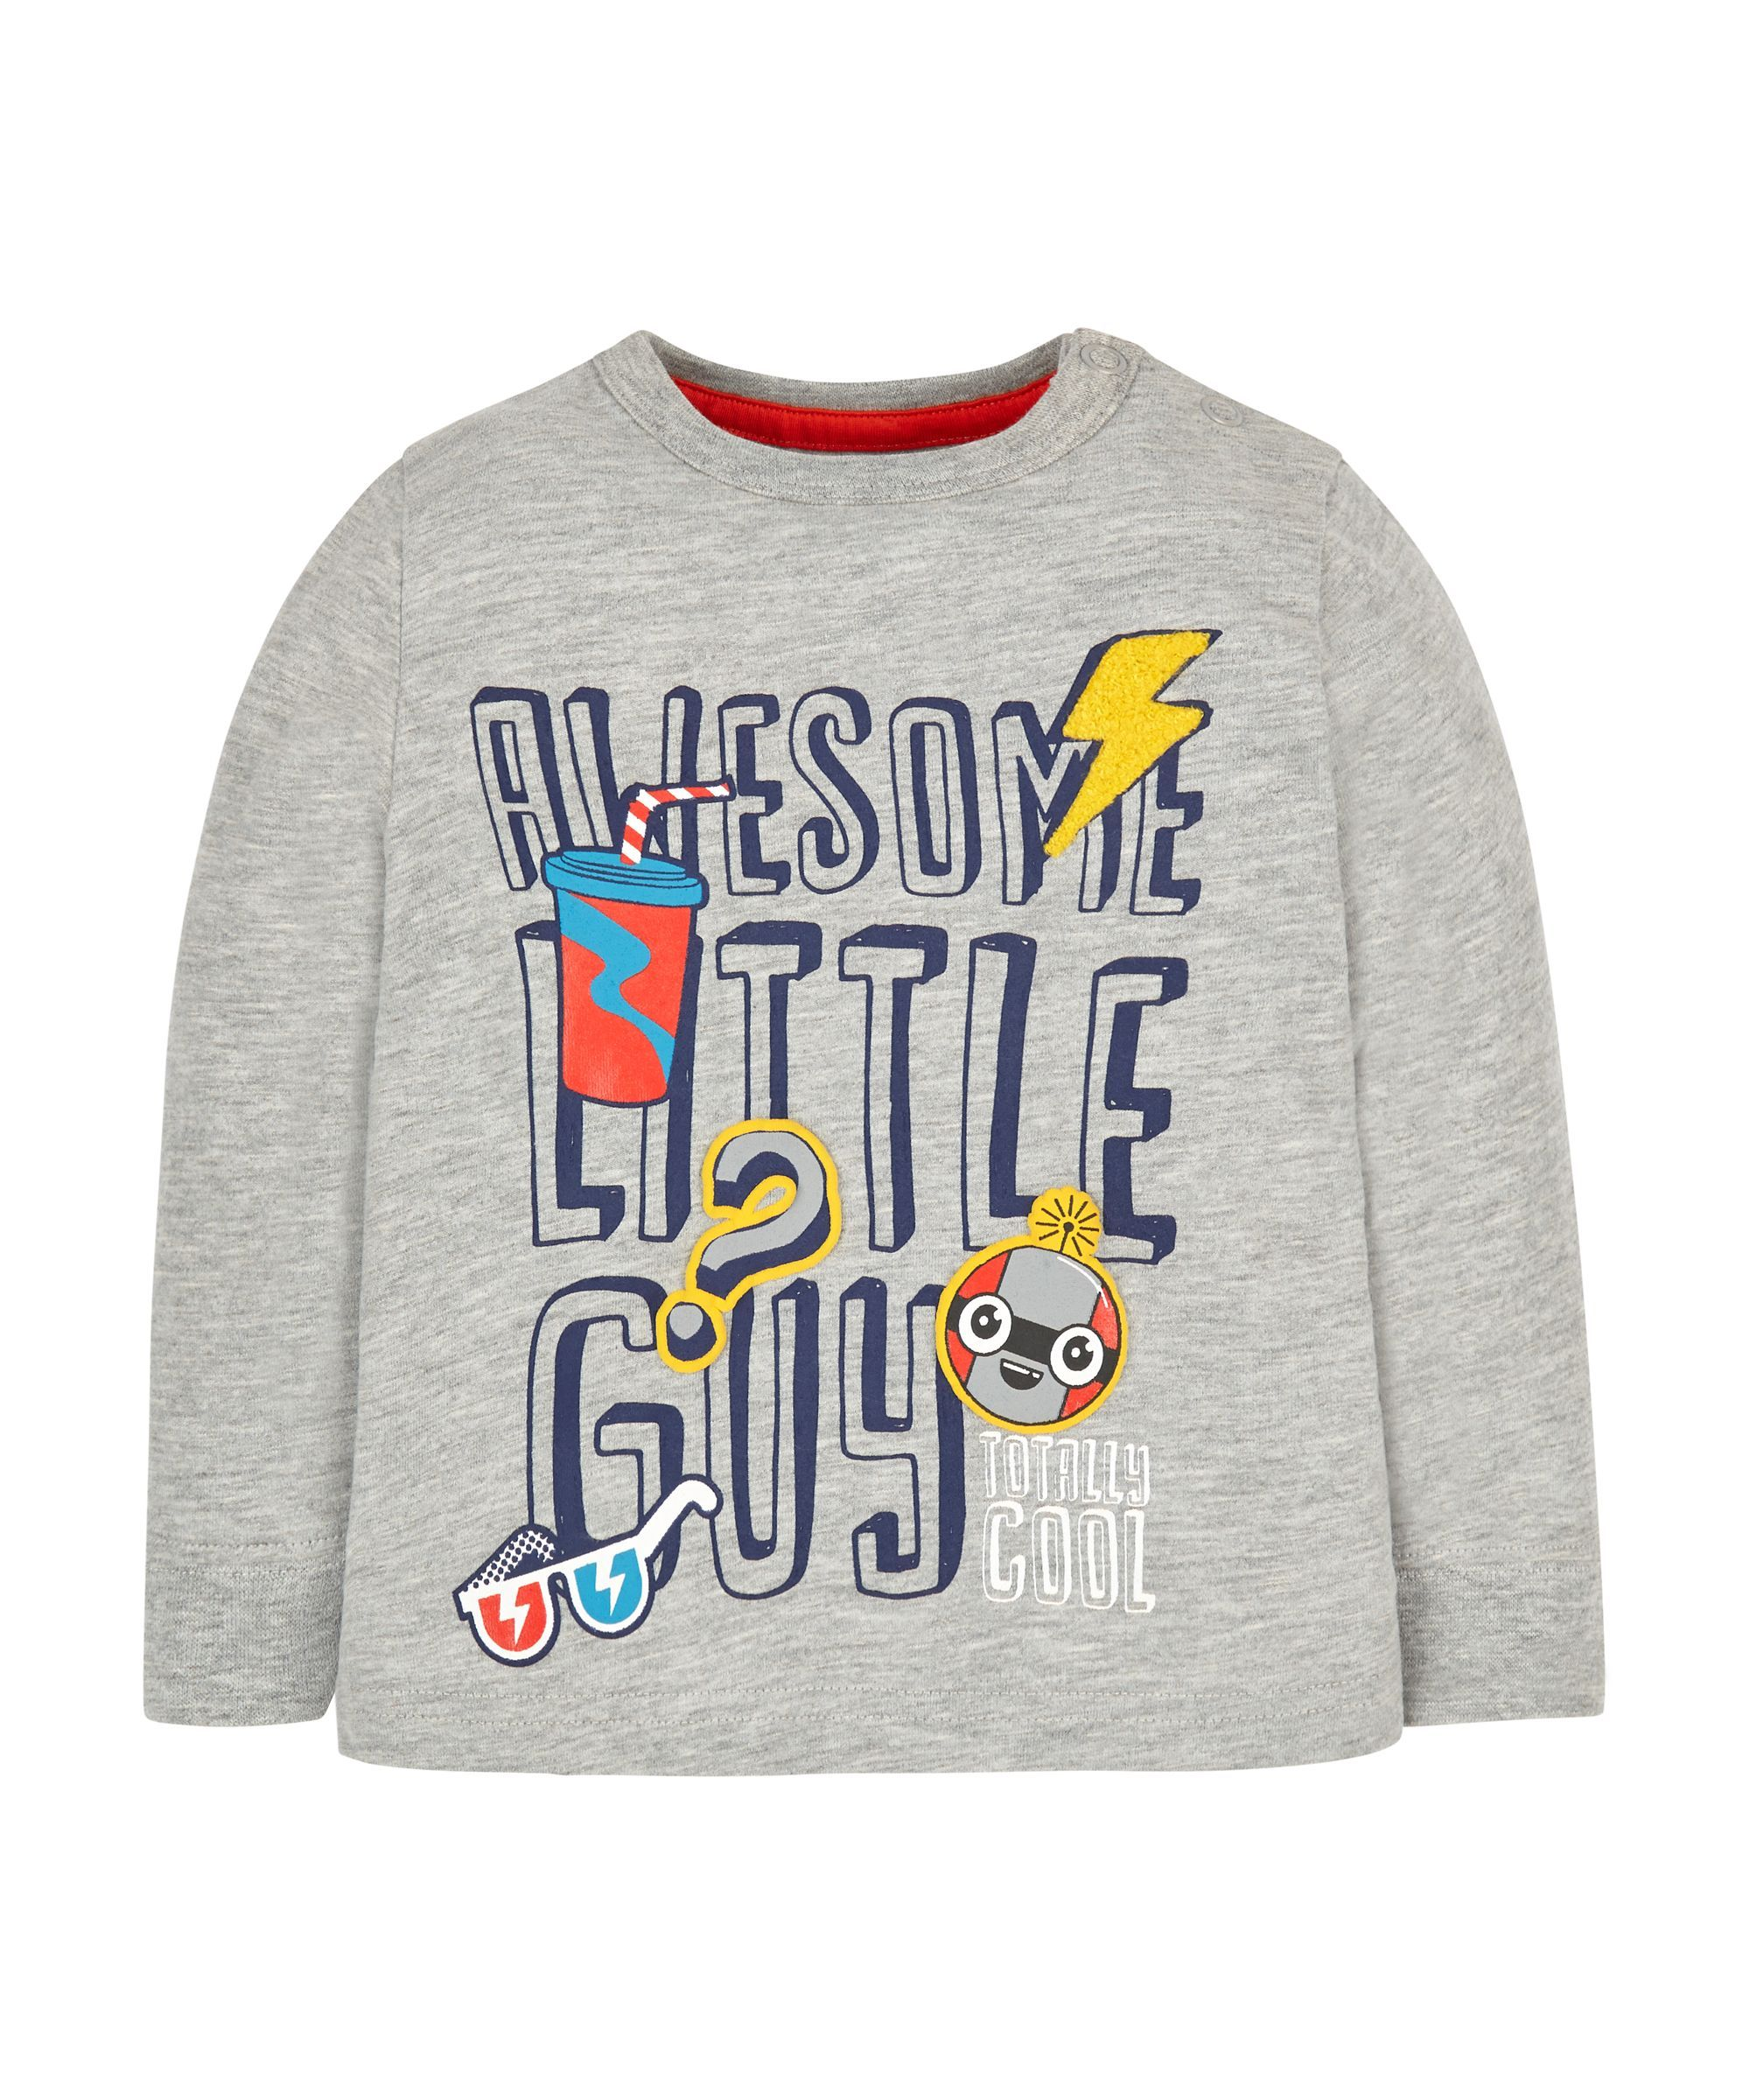 Pop Awesome Graphic T-Shirt | Kids nightwear